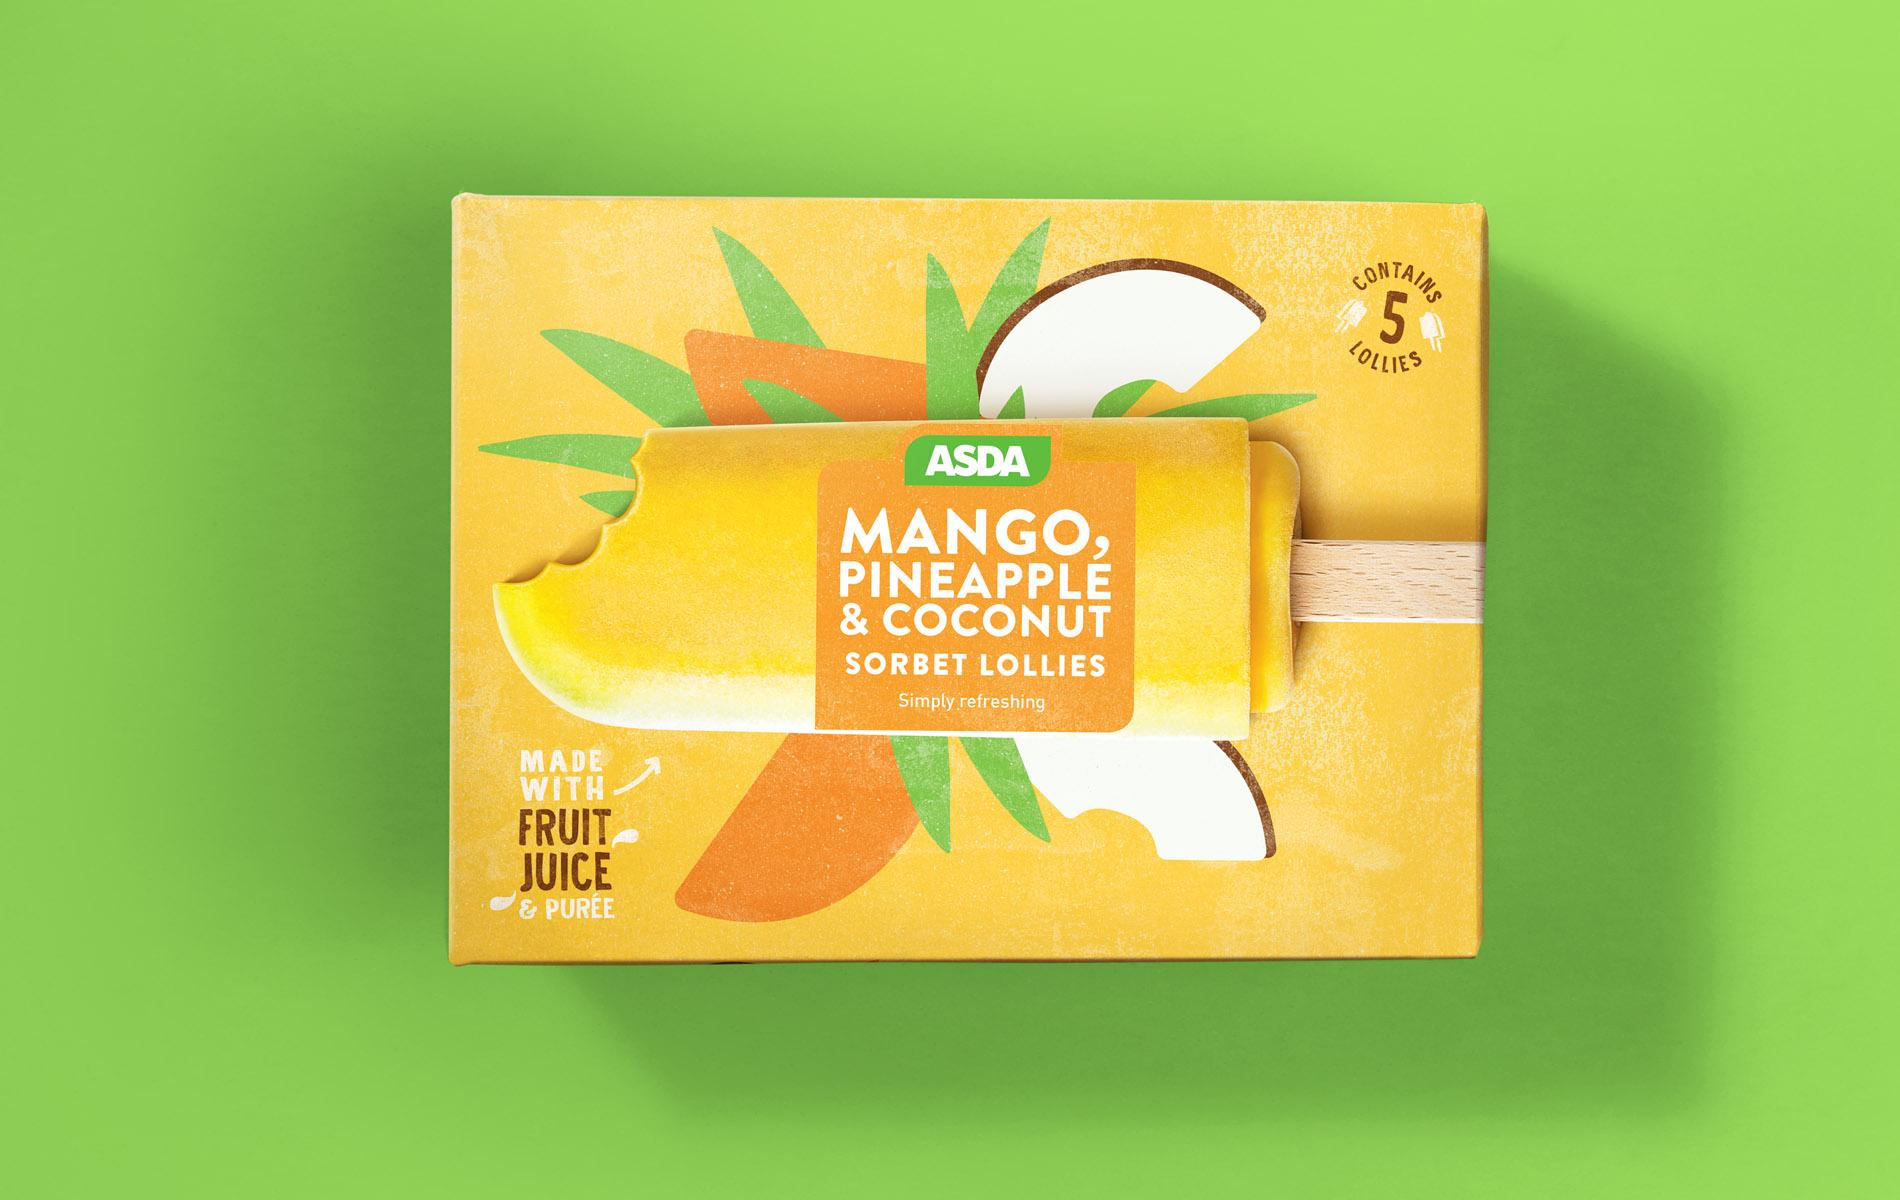 Packaging design of mango sorbet lollies